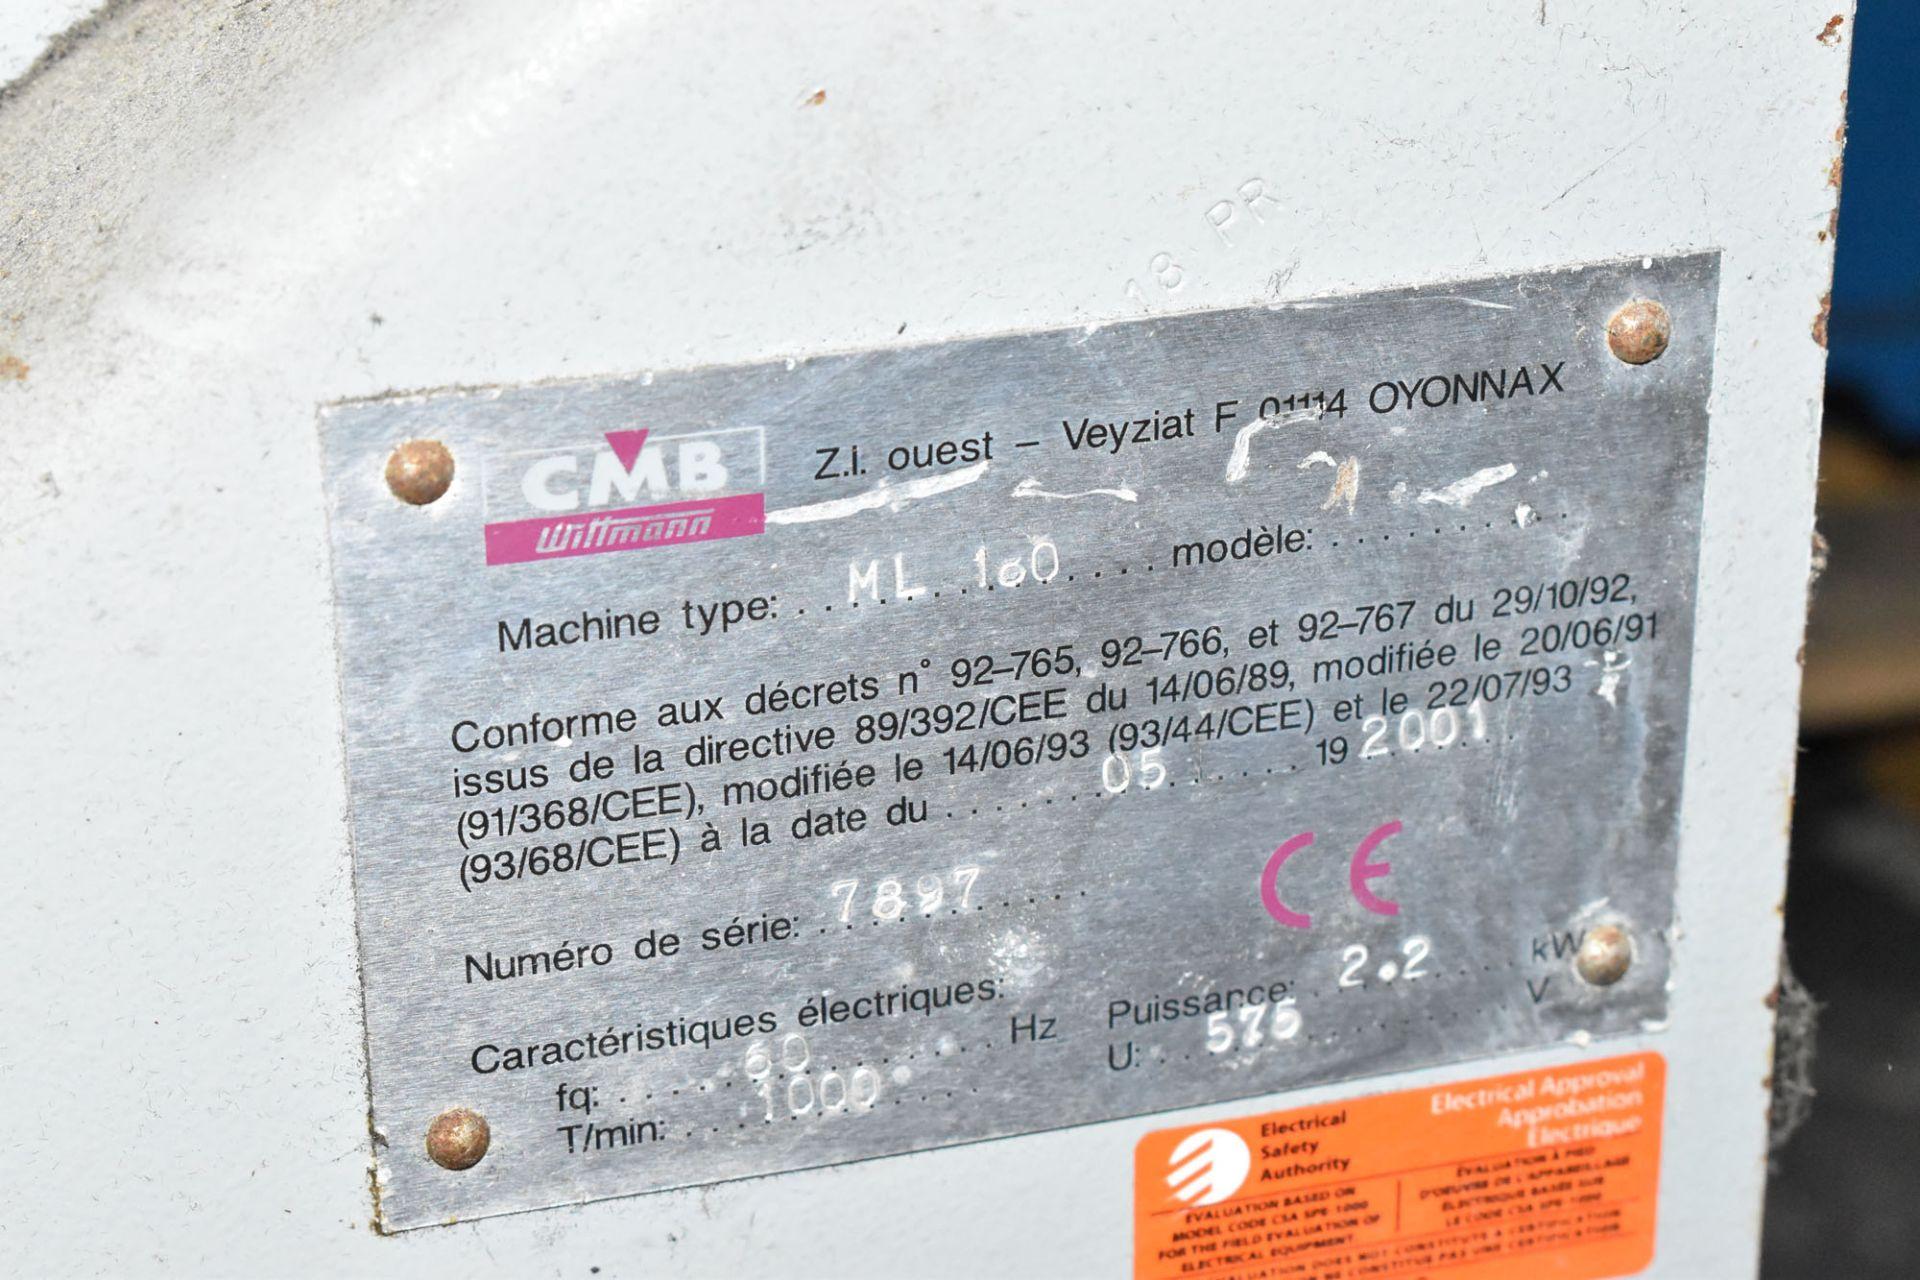 WITTMANN CMB ML180 PORTABLE GRANULATOR, S/N: 7897 - Image 3 of 3